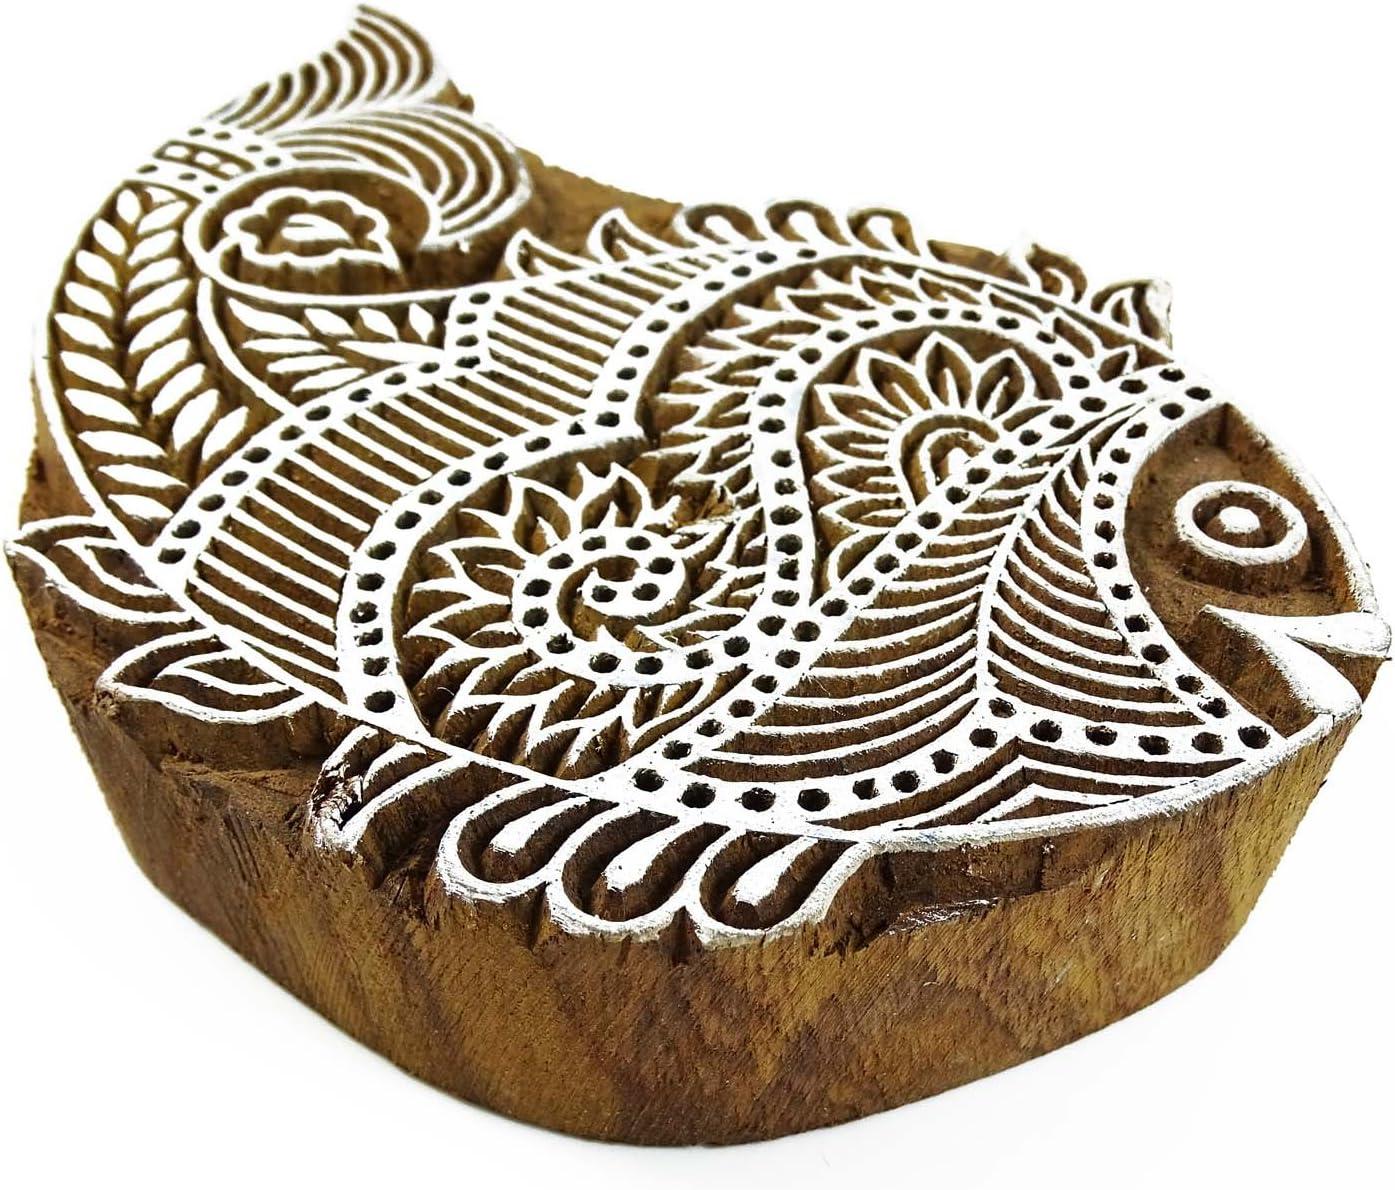 Fisch Stempel Holz Stempel Indischen Handdruck Block Textil-Stempel Sehnte